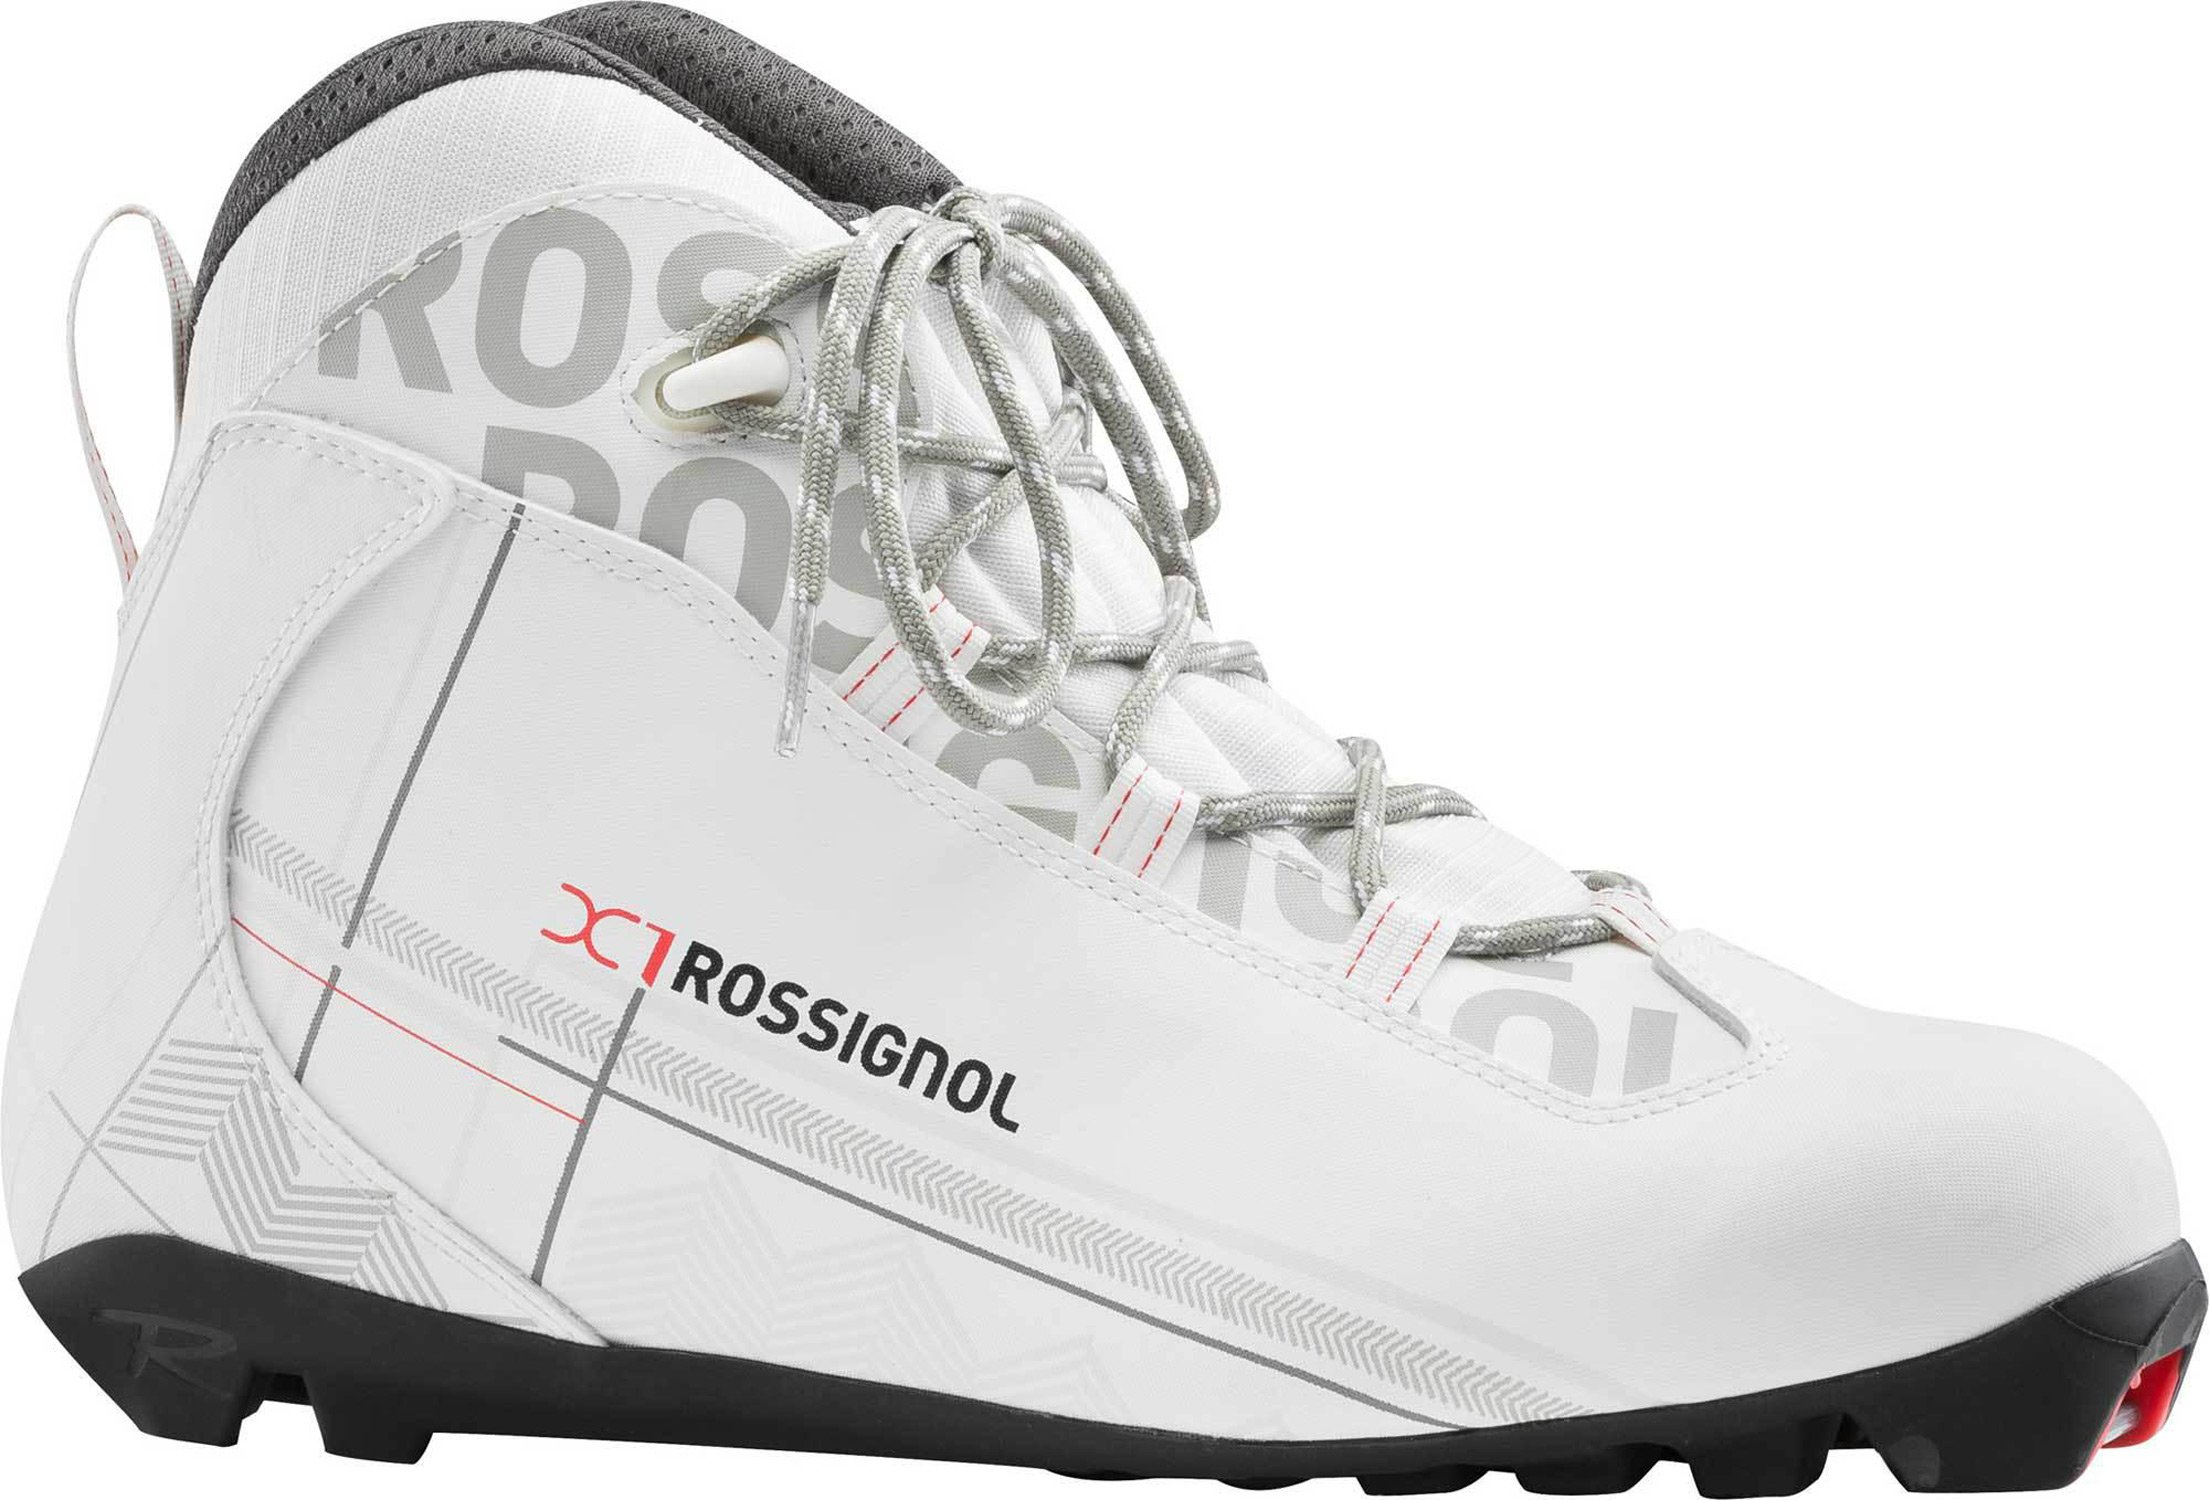 Rossignol X 1 FW Womens NNN Cross Country Ski Boots